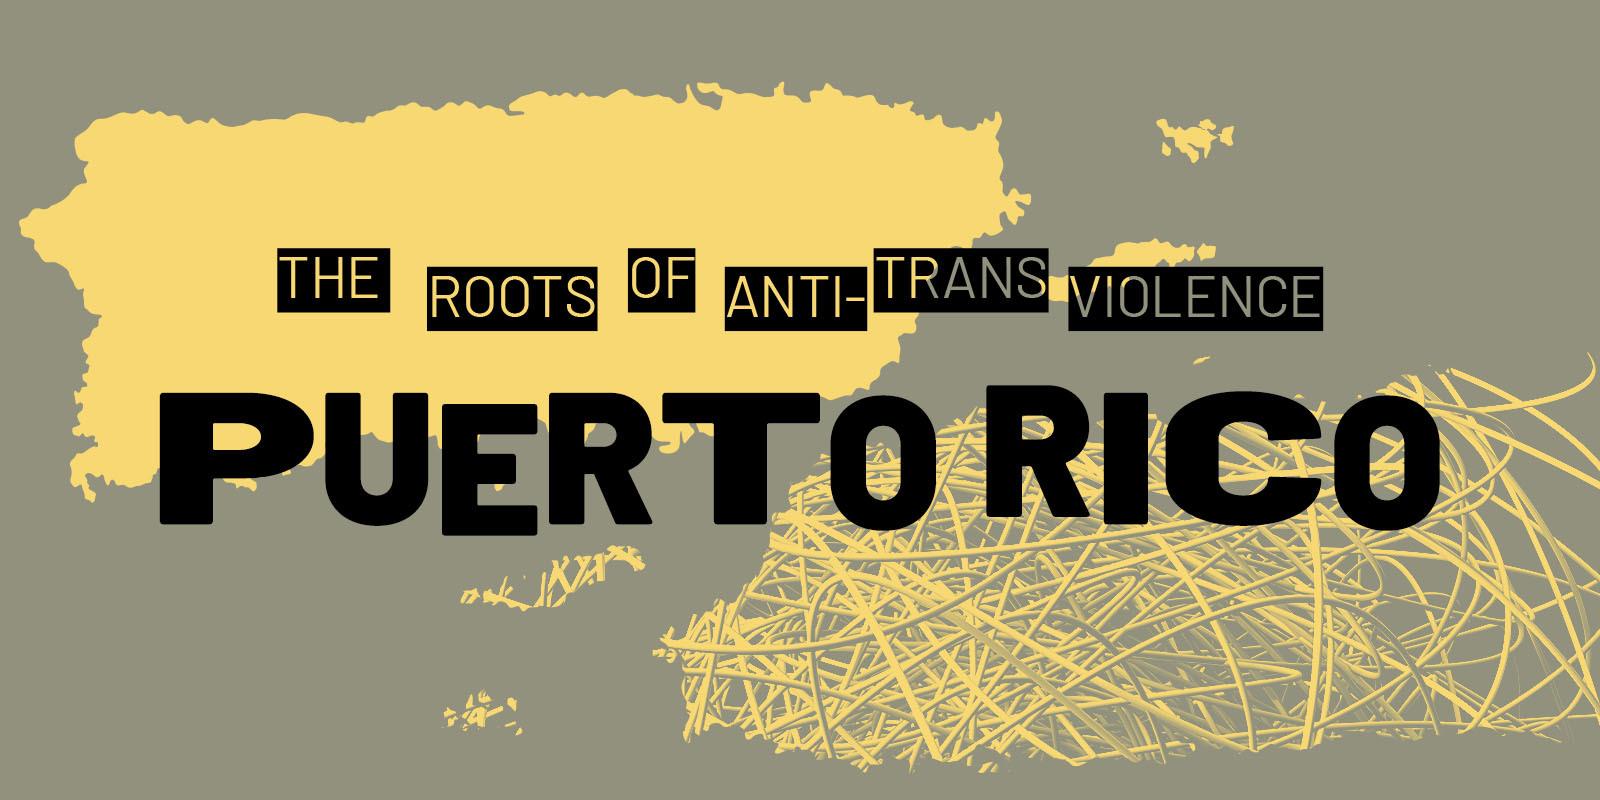 Les racines de la violence anti-trans: Porto Rico.